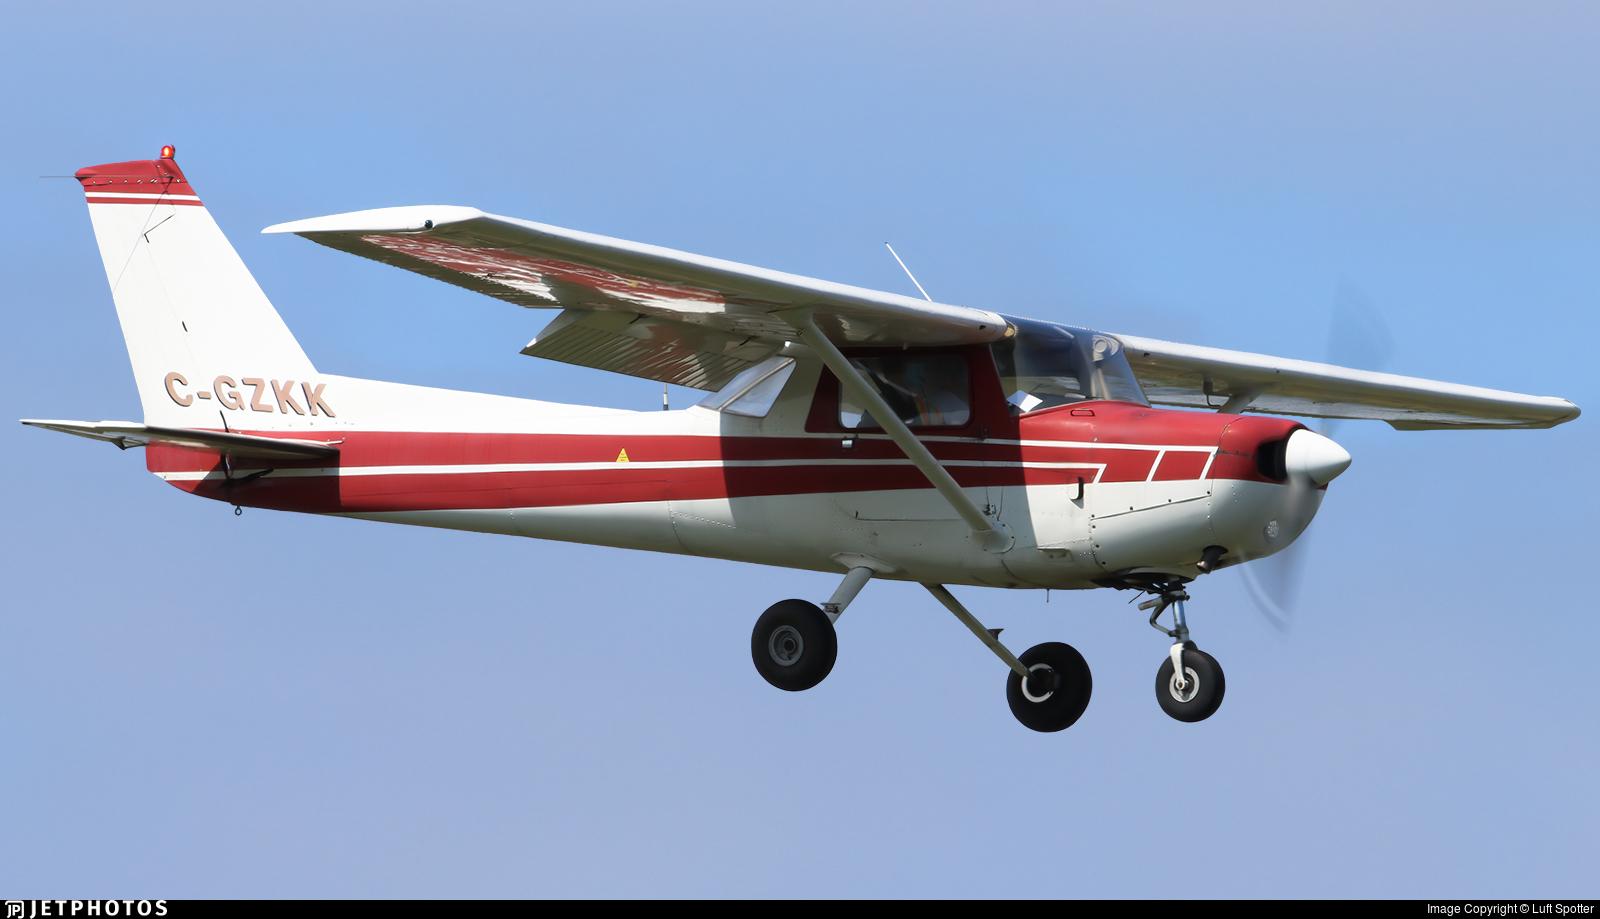 C-GZKK - Cessna 152 - Pacific Flying Club